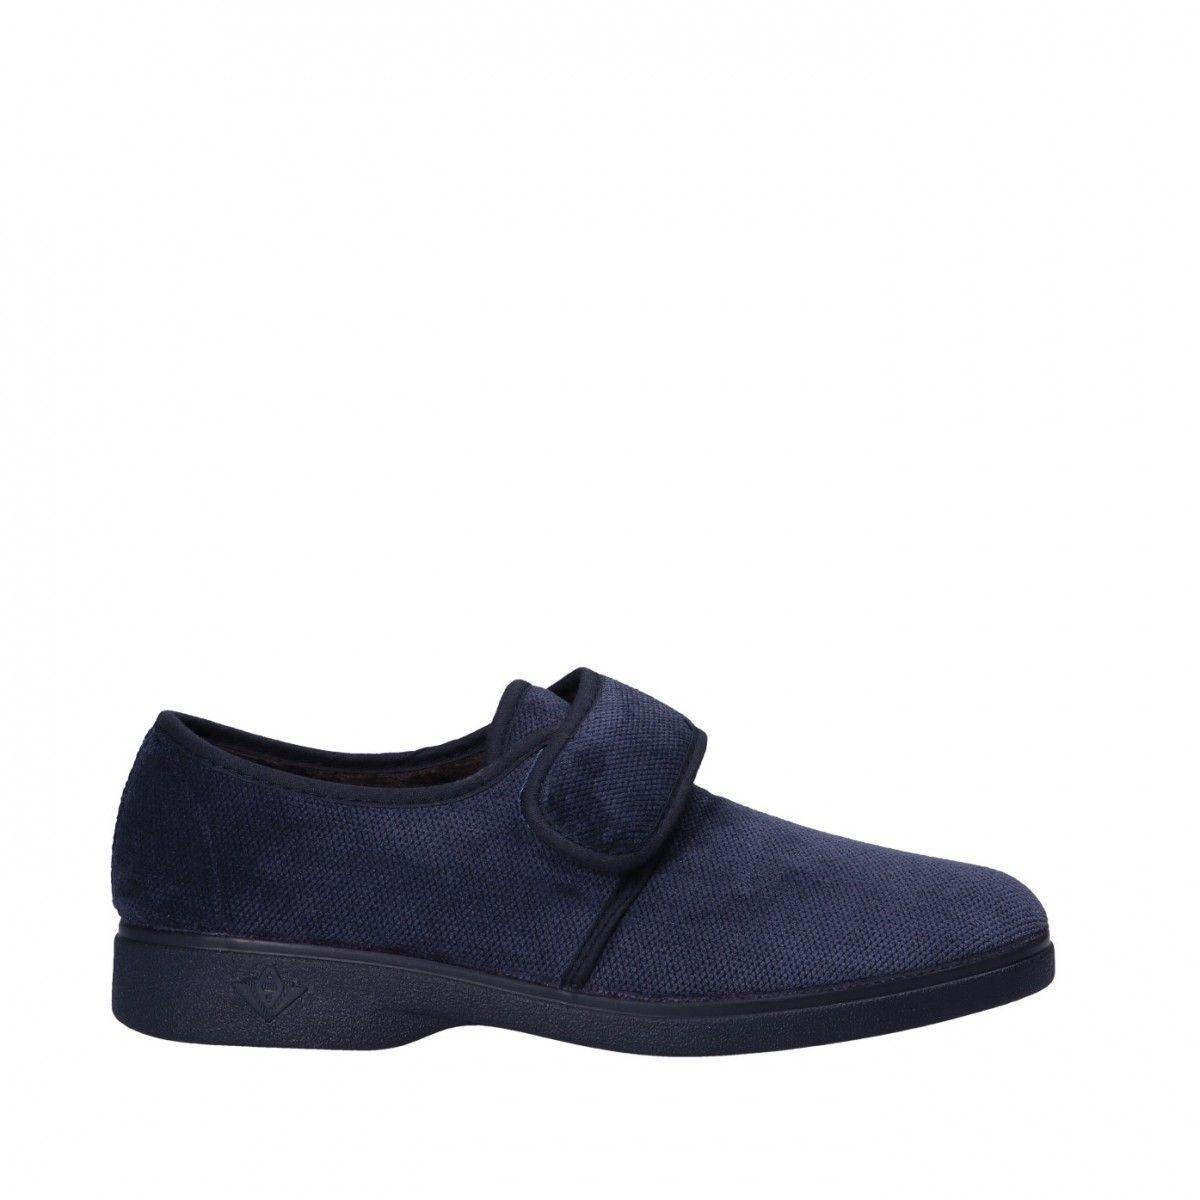 Cinzia soft Pantofola Blu Gomma IEBT7891 001